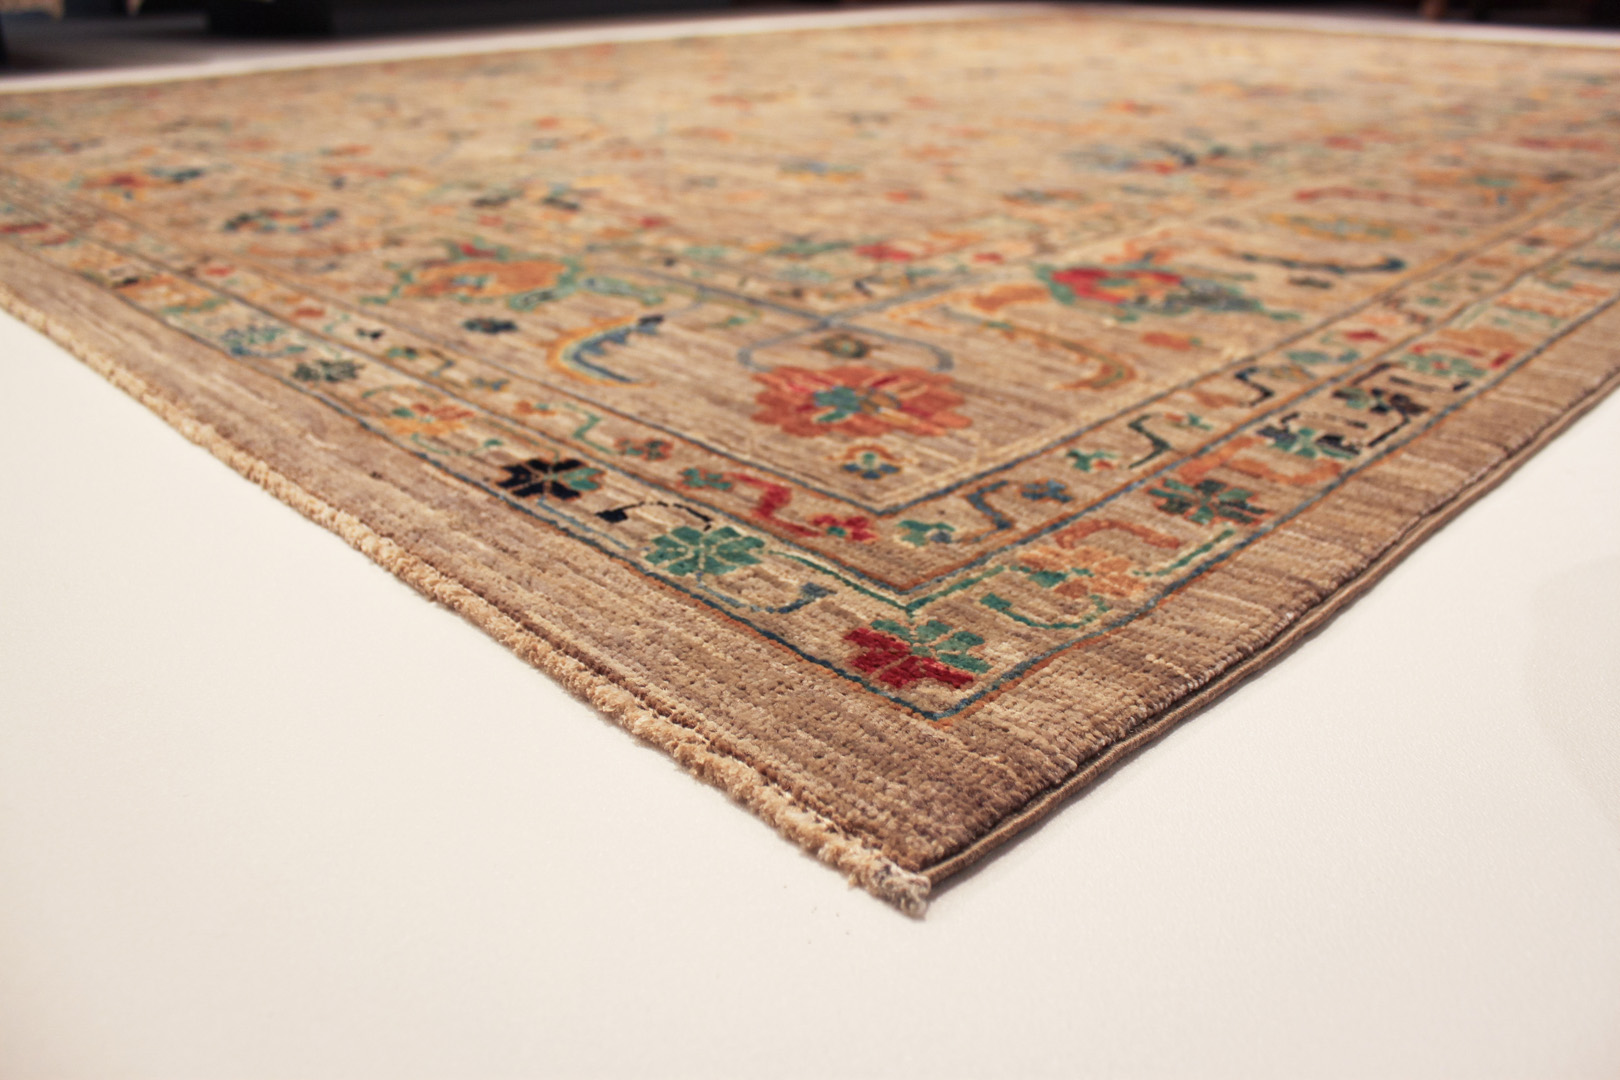 BO tepp-Teppich Ziegler modern 242 x 342 cm Einzelstück